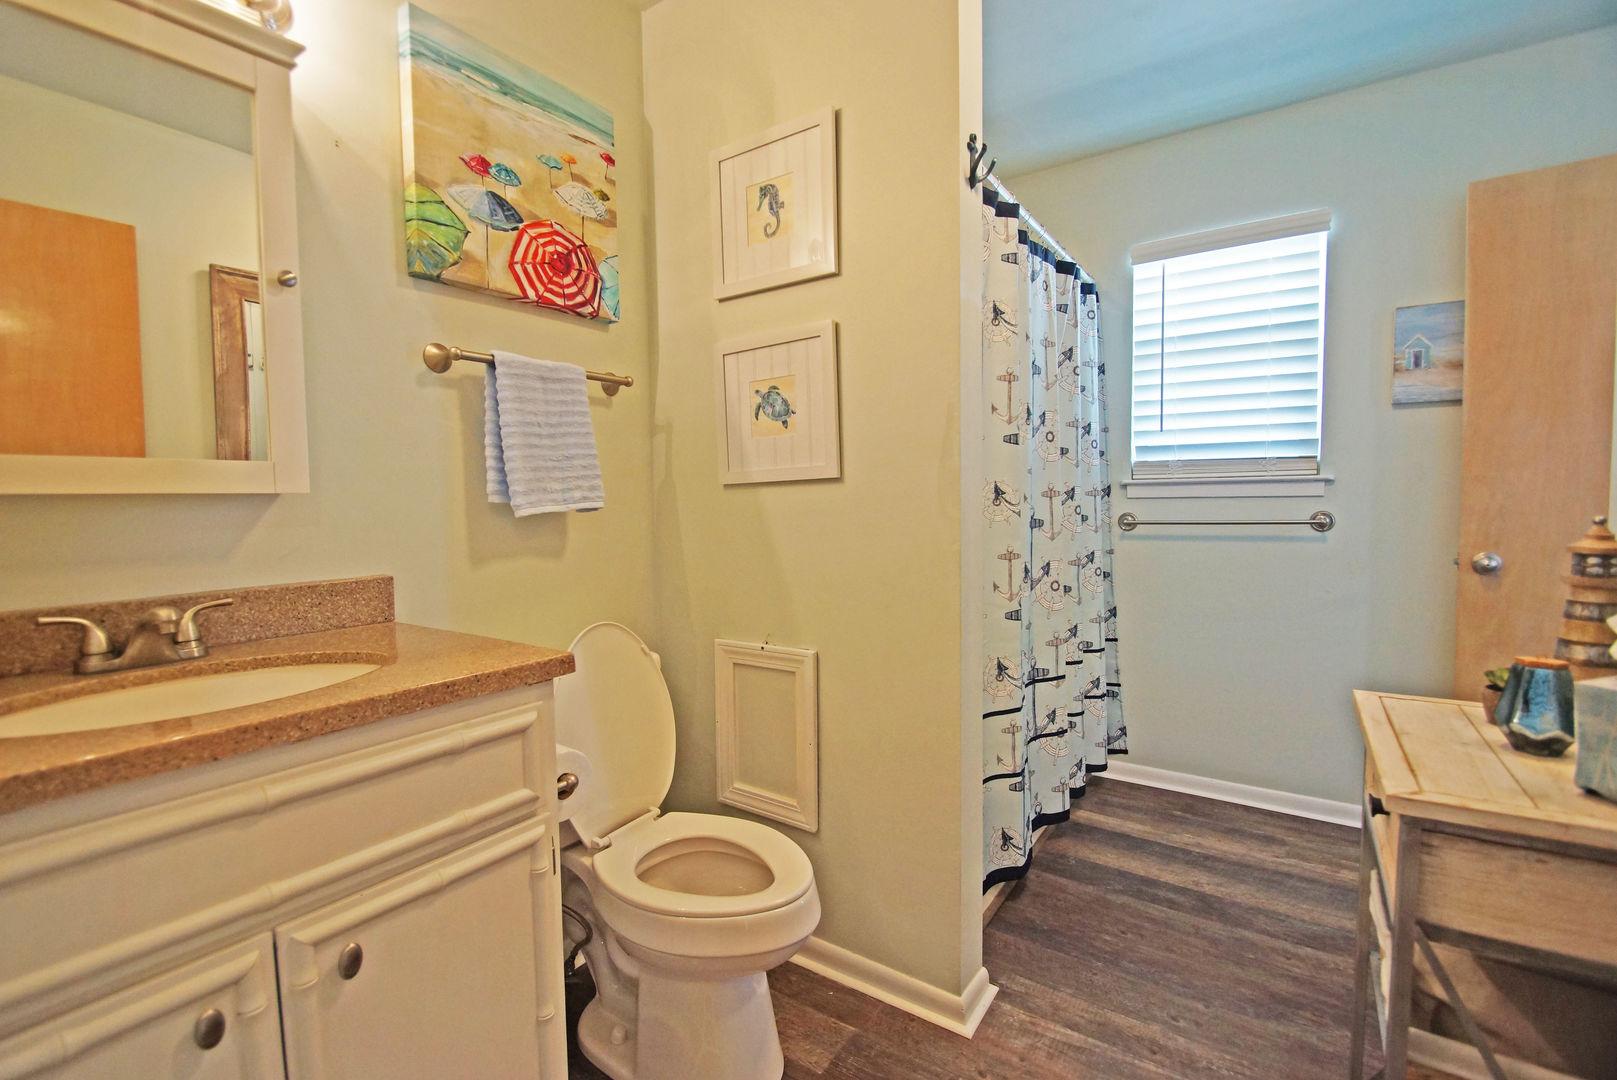 Single Vanity Sink, Shower, Mirror, and Toilet.